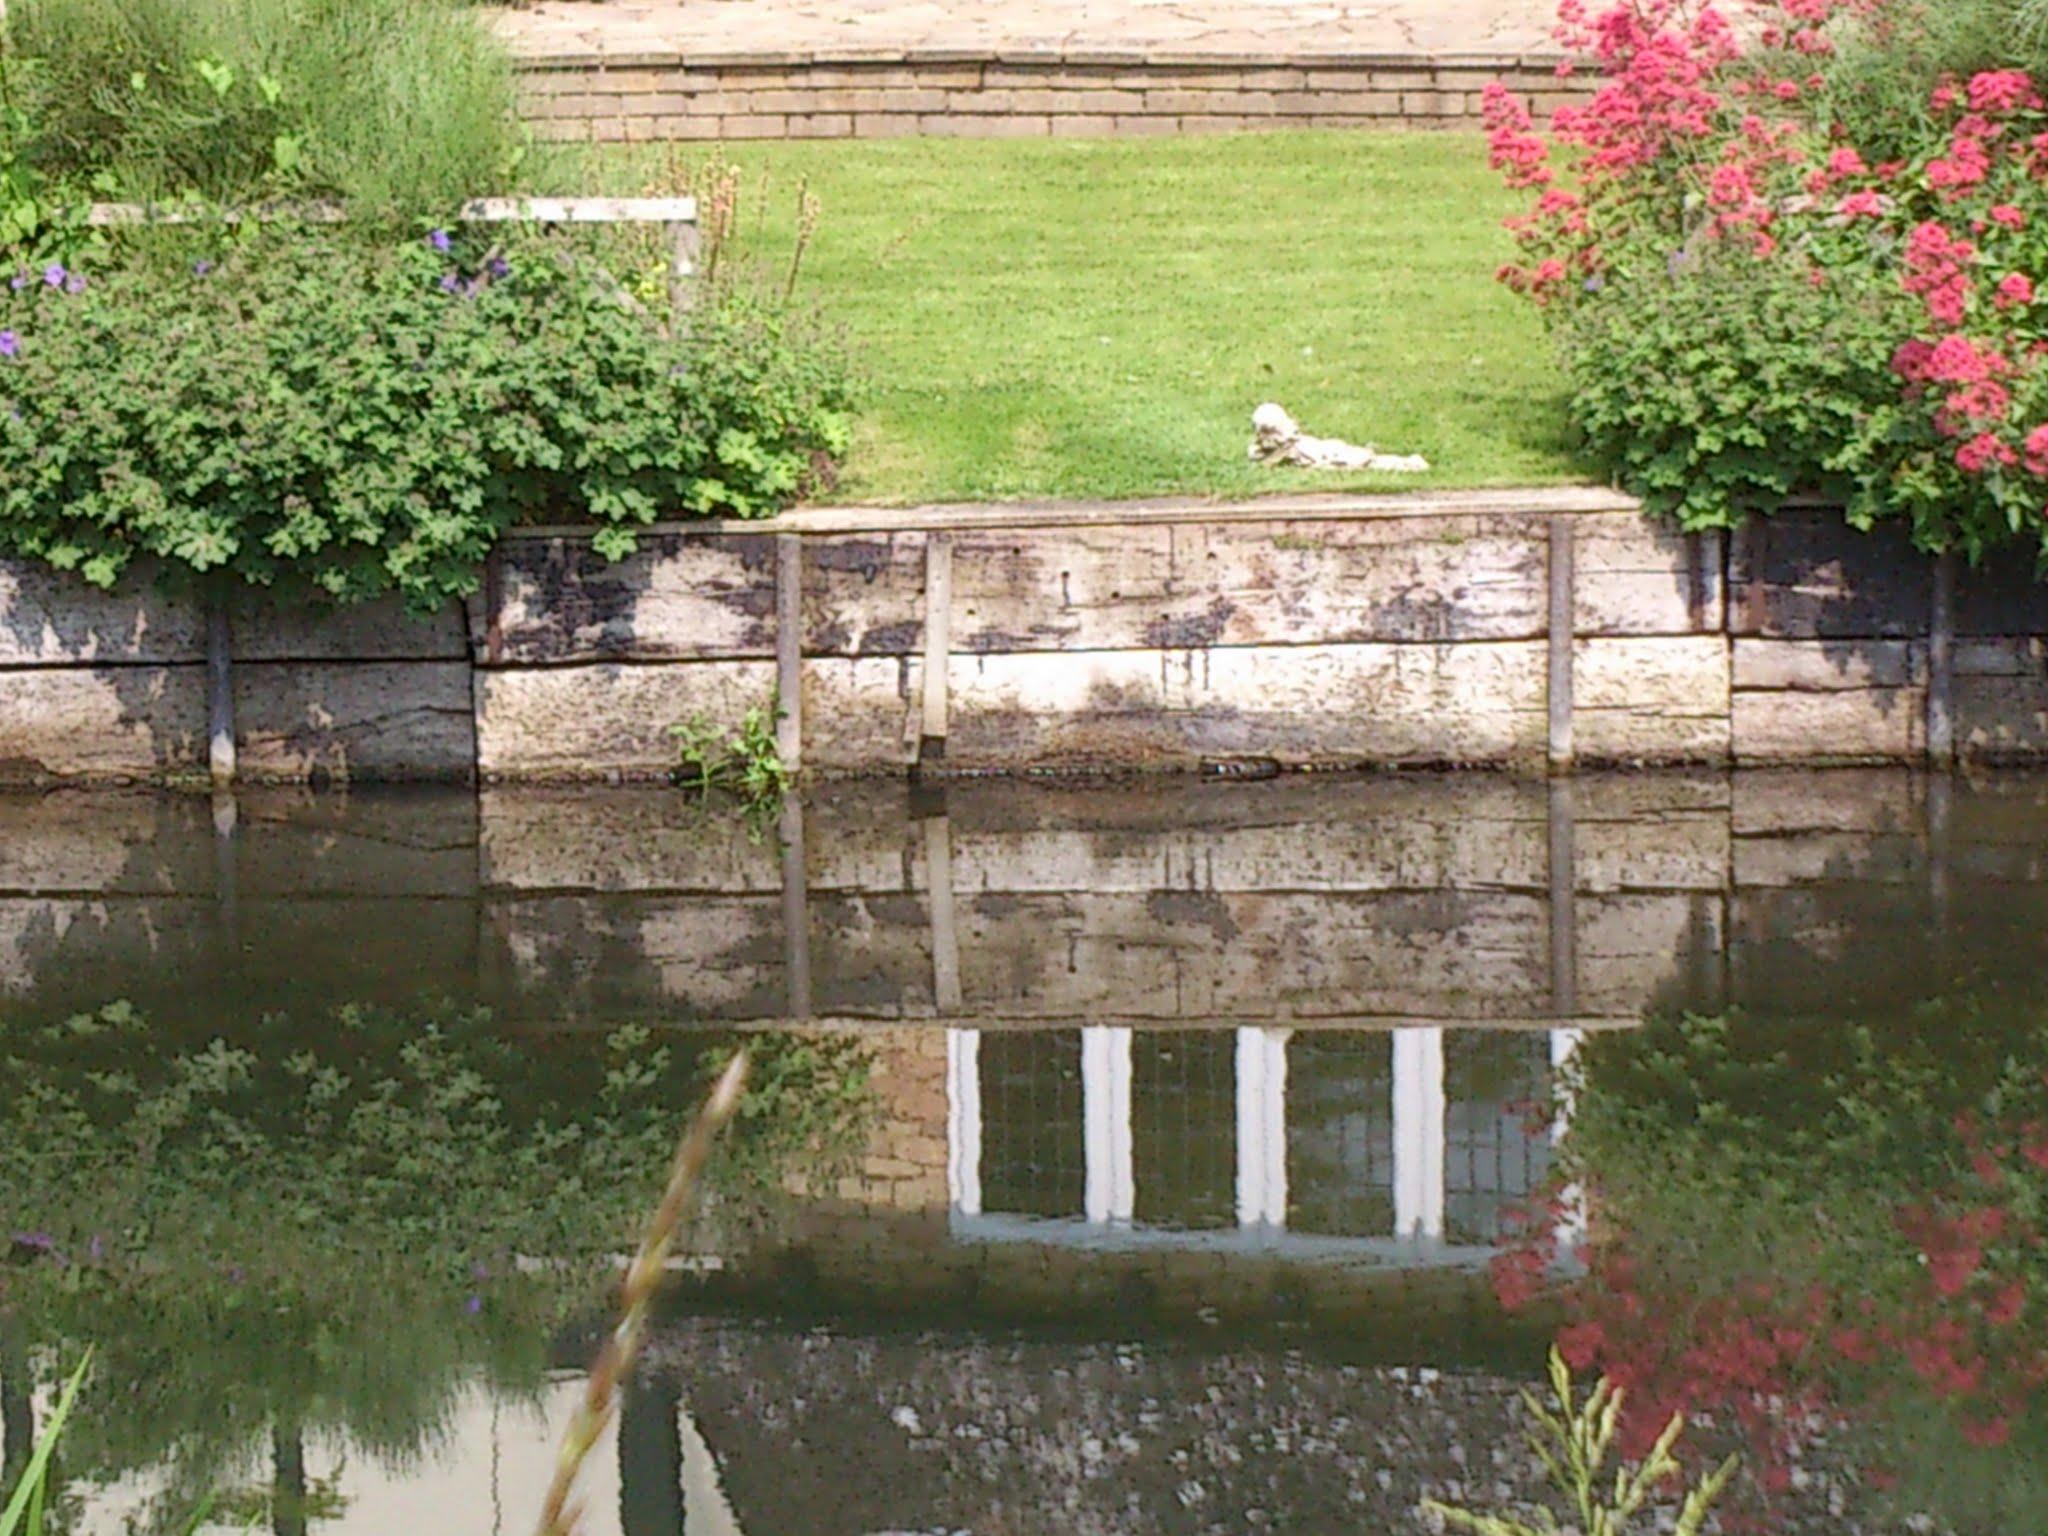 Riverbank retainment